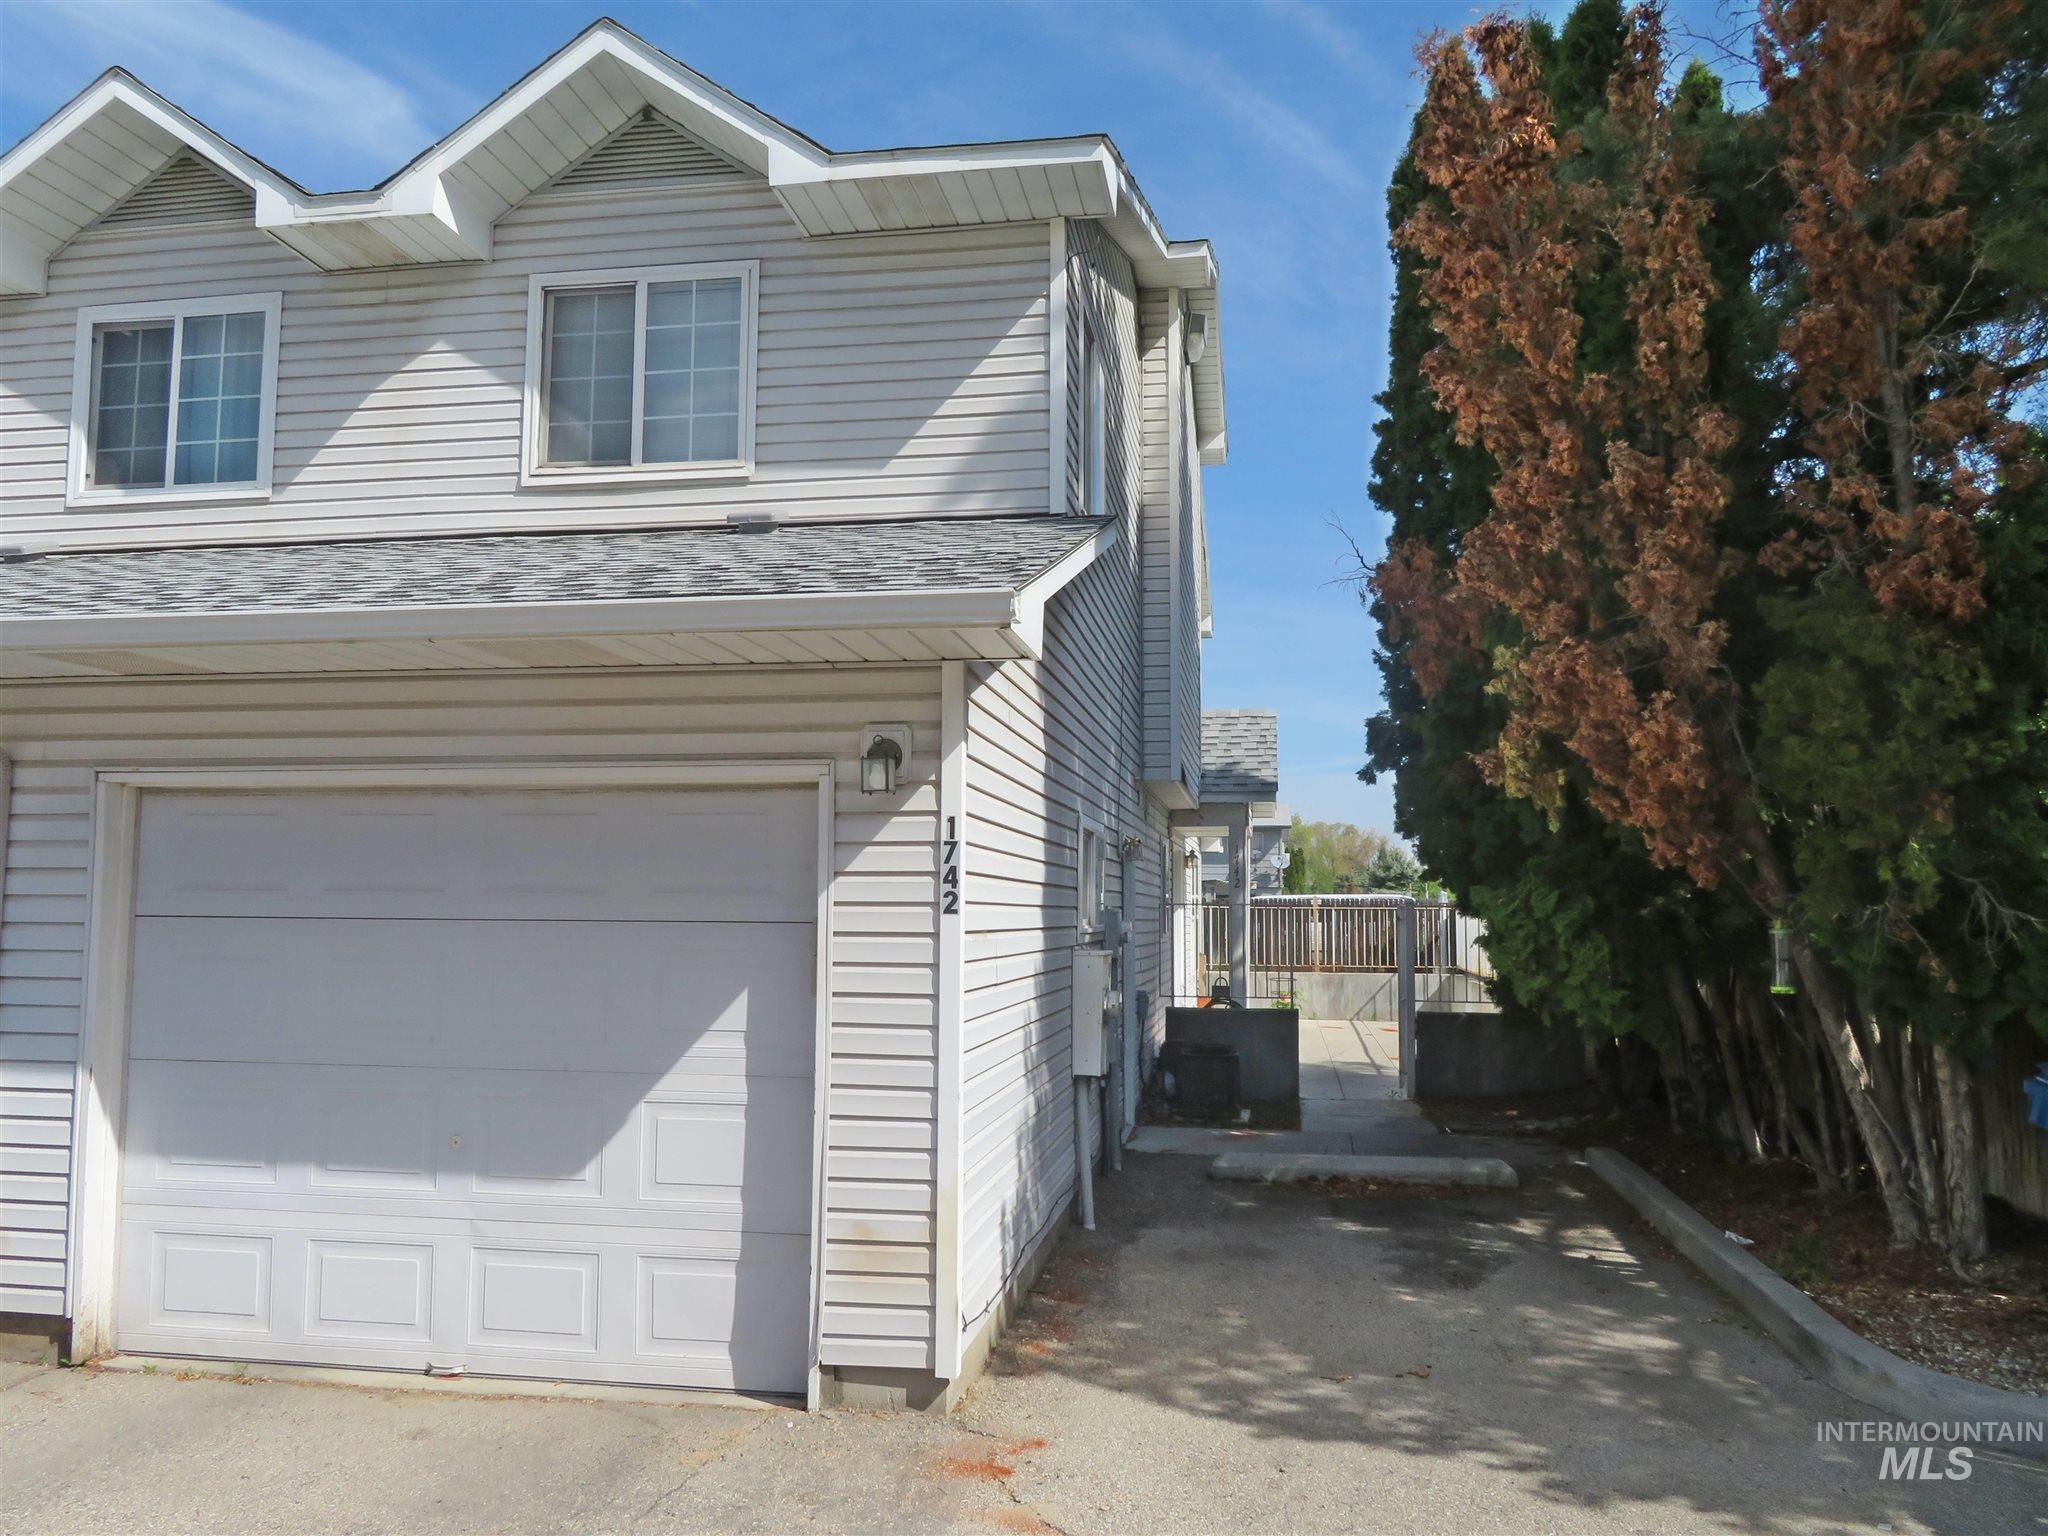 1742 S Juniper Property Photo - Nampa, ID real estate listing